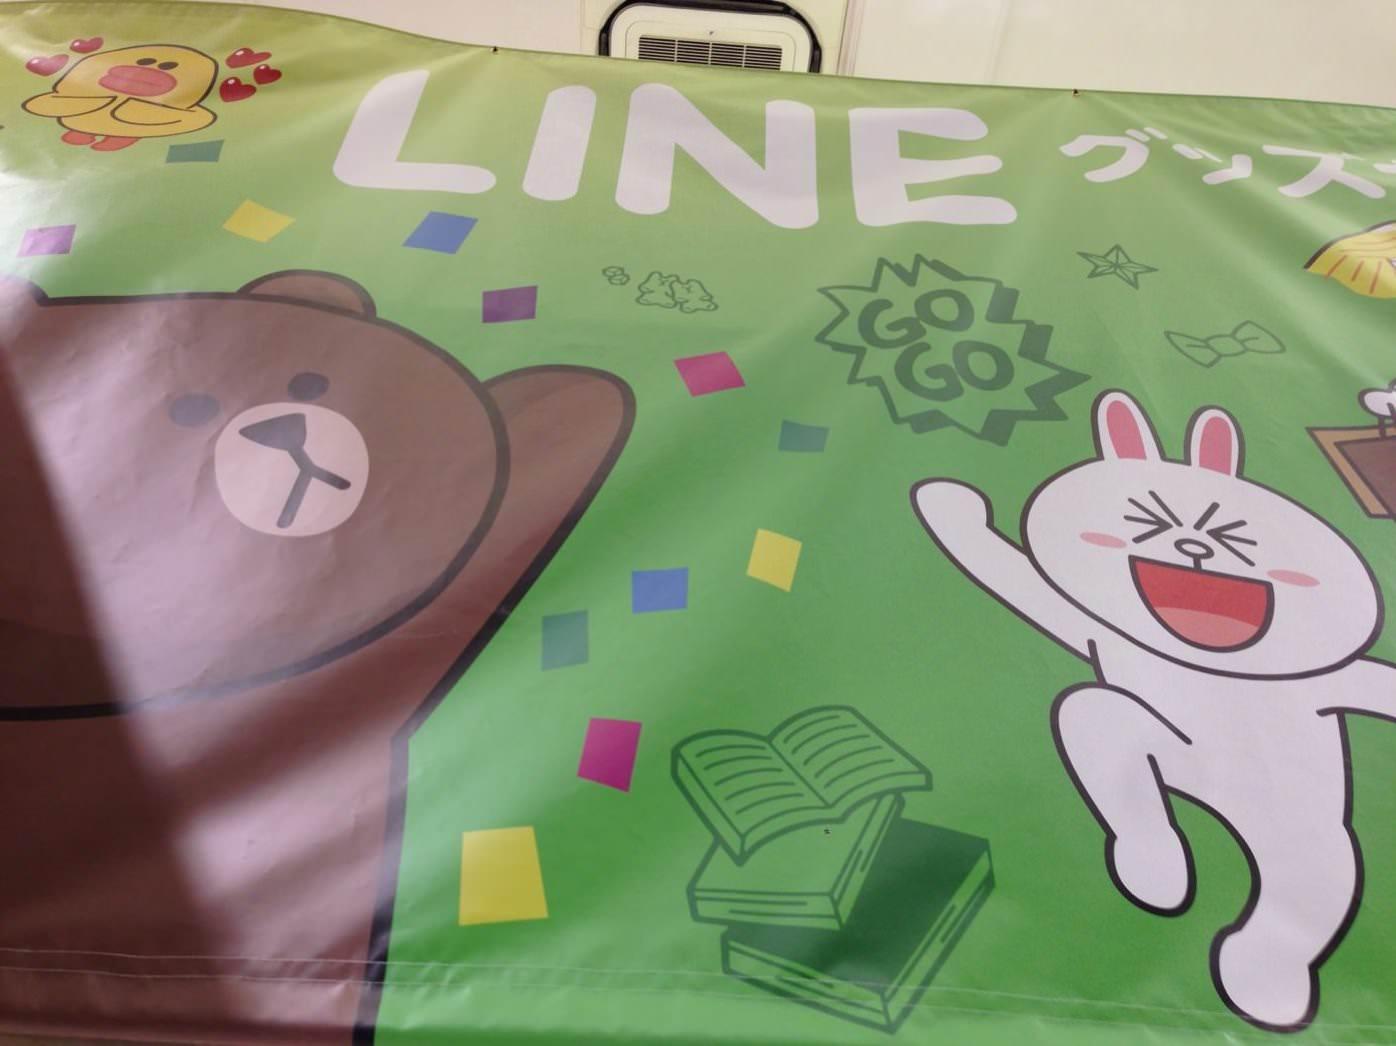 AppBank Store 新宿のLINE垂れ幕